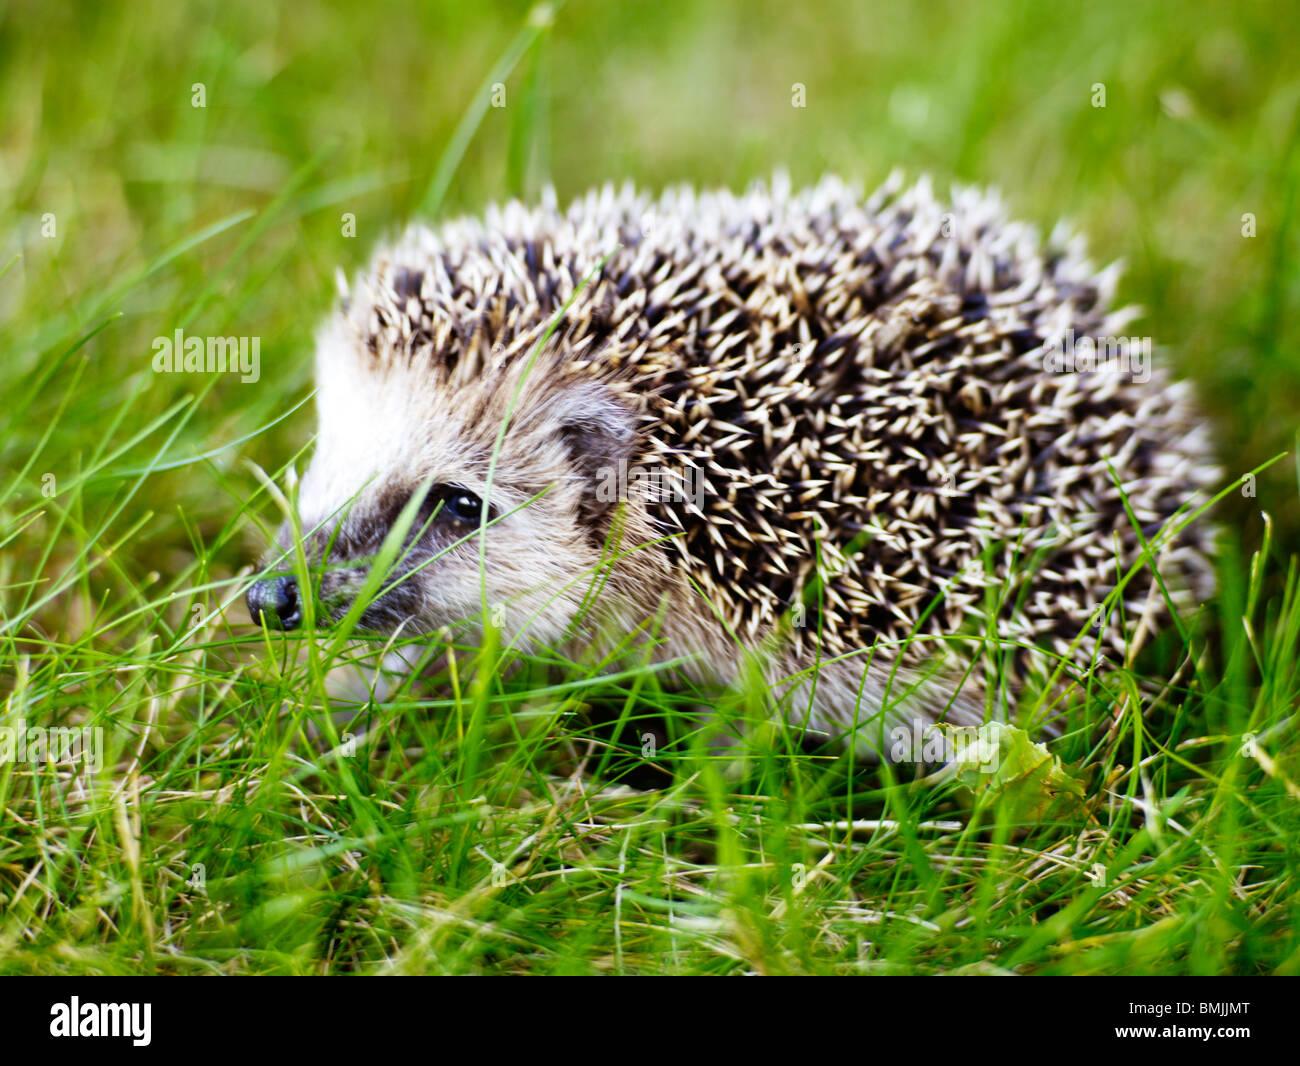 Scandinavia, Sweden, Hedgehog on grass, close-up - Stock Image